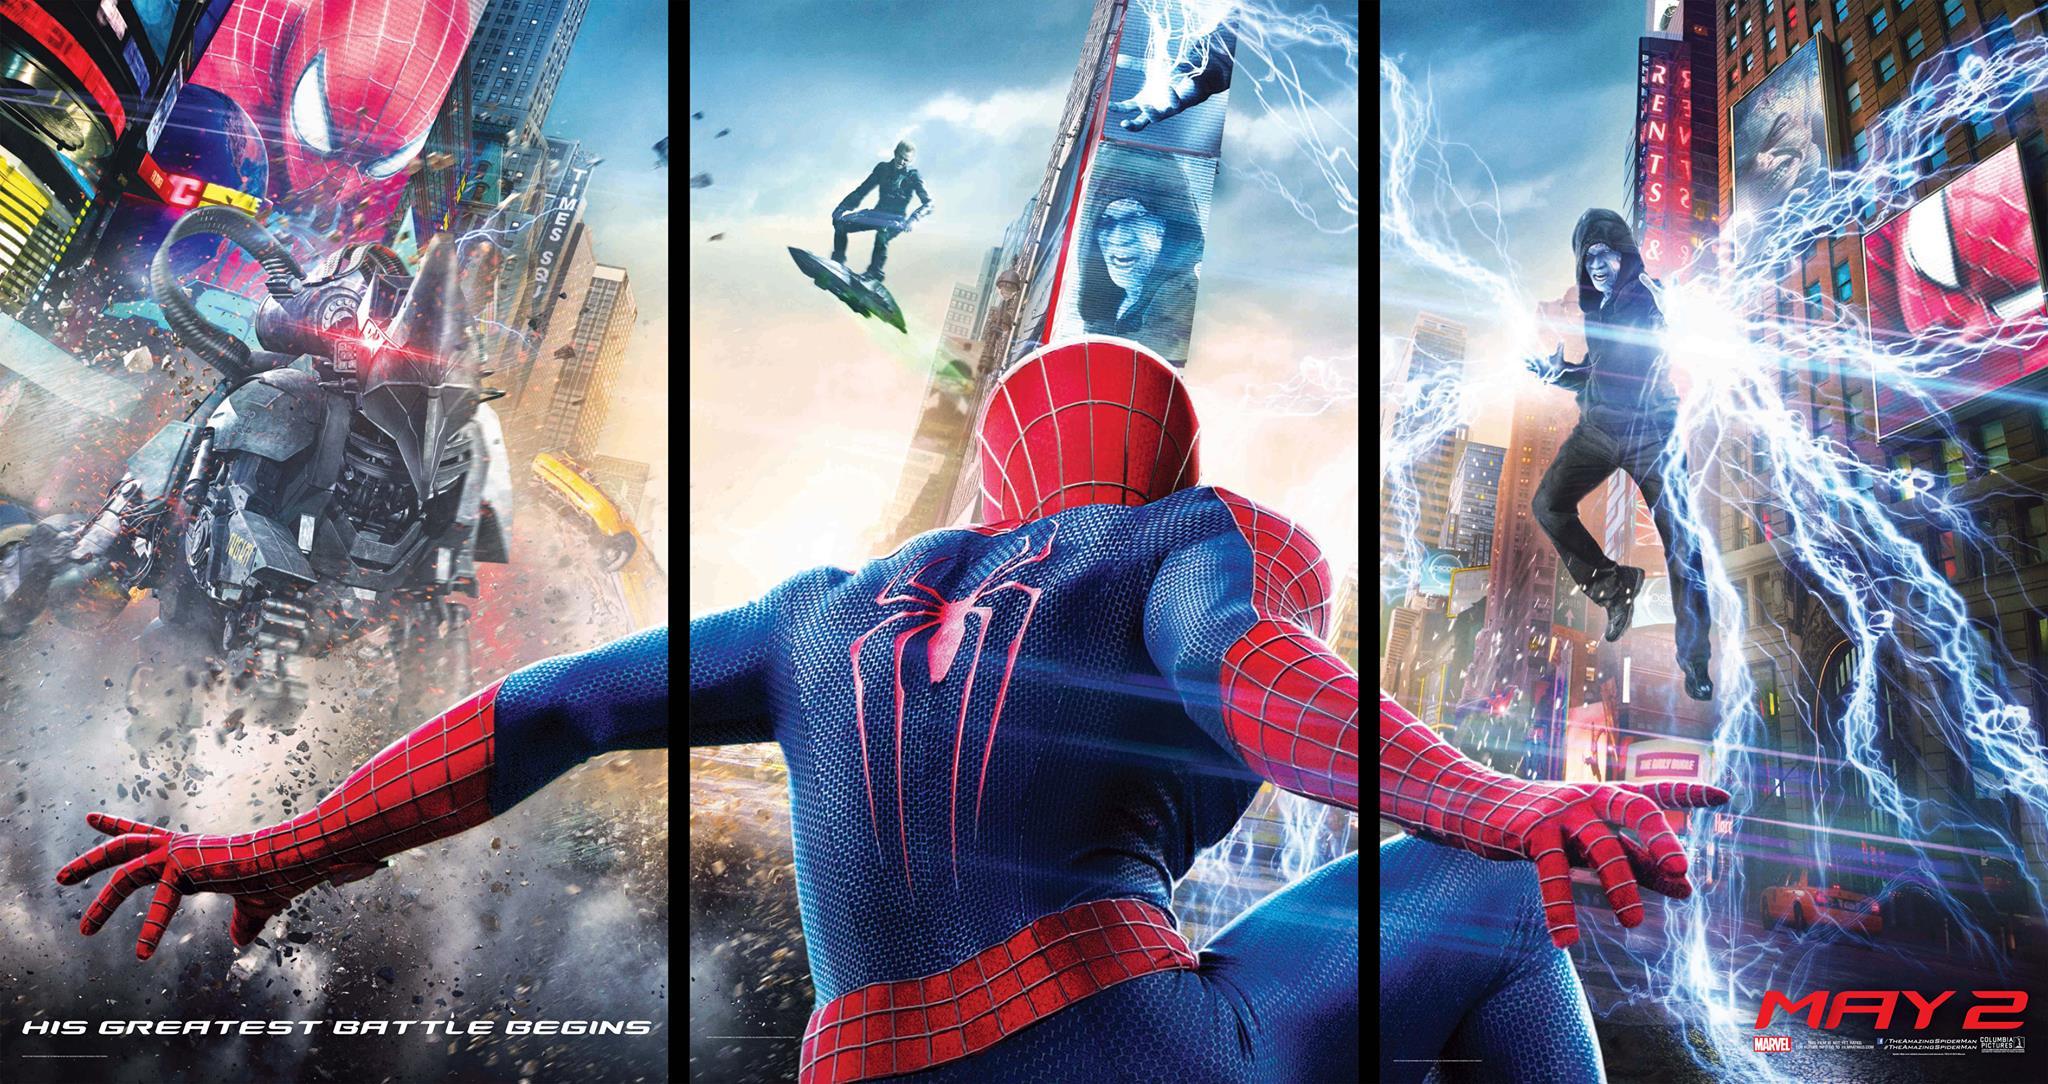 the-amazing-spider-man-2-affiche-poster-film